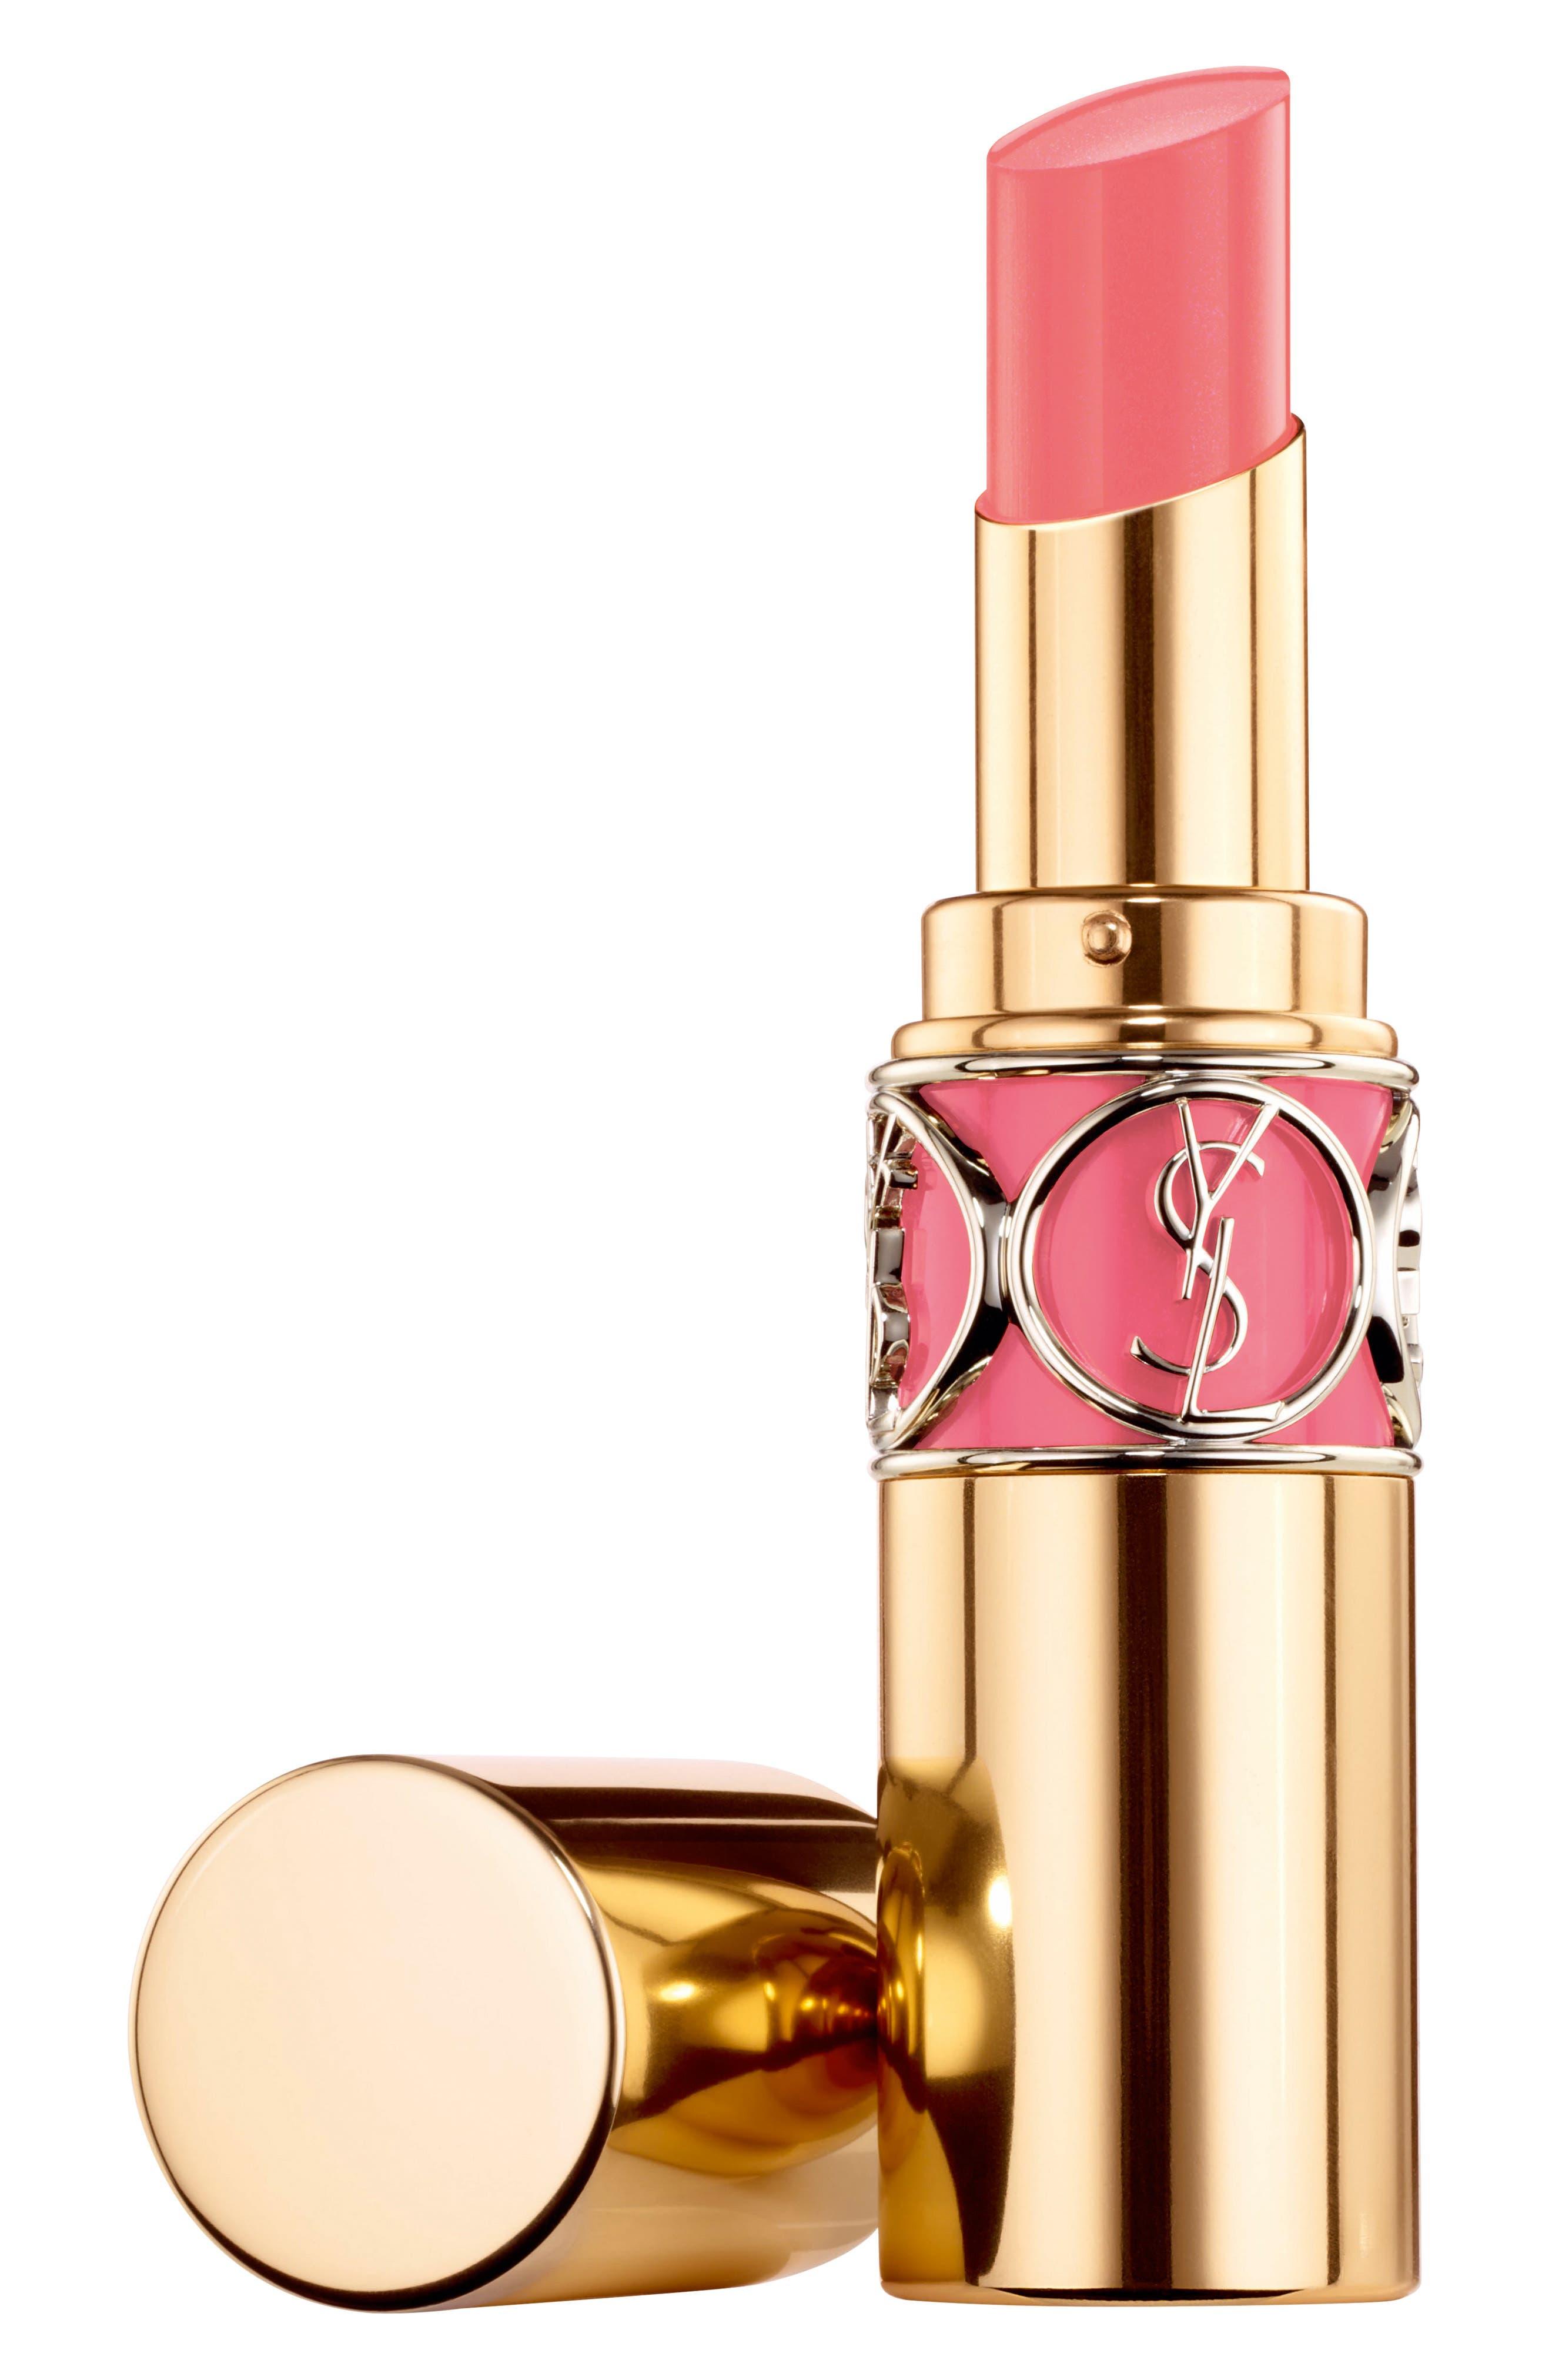 Yves Saint Laurent Rouge Volupte Shine Oil-In-Stick Lipstick - 41 Corail A Porter